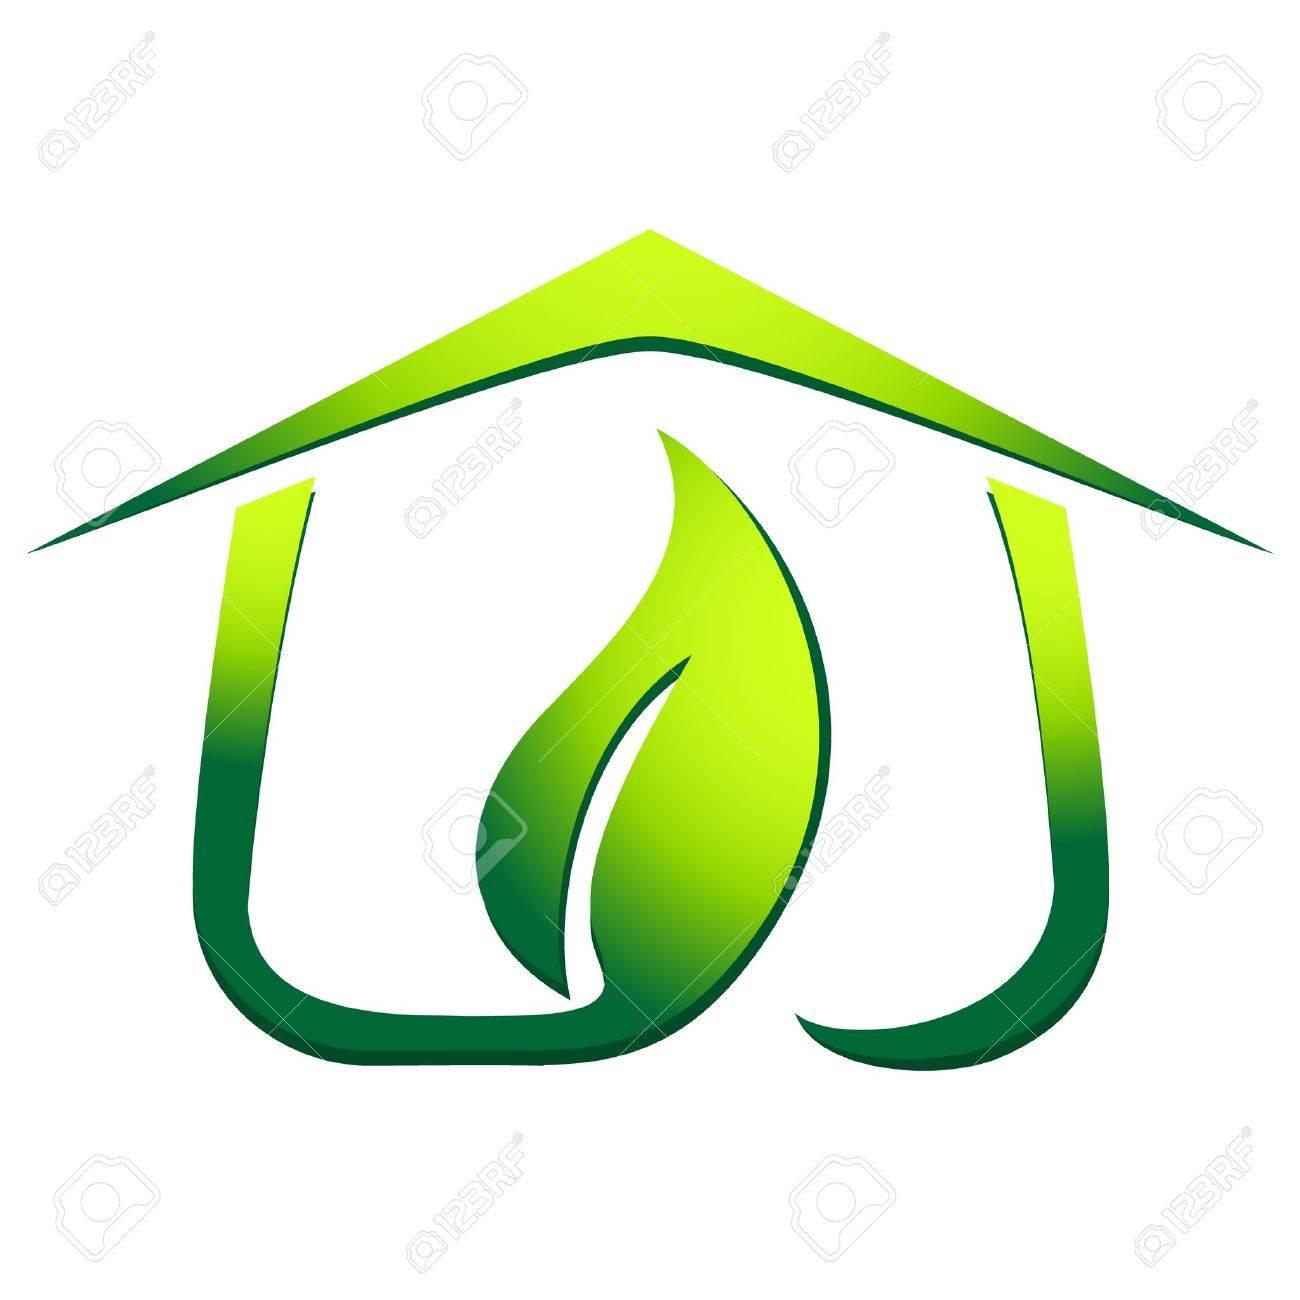 green eco house - 21808159